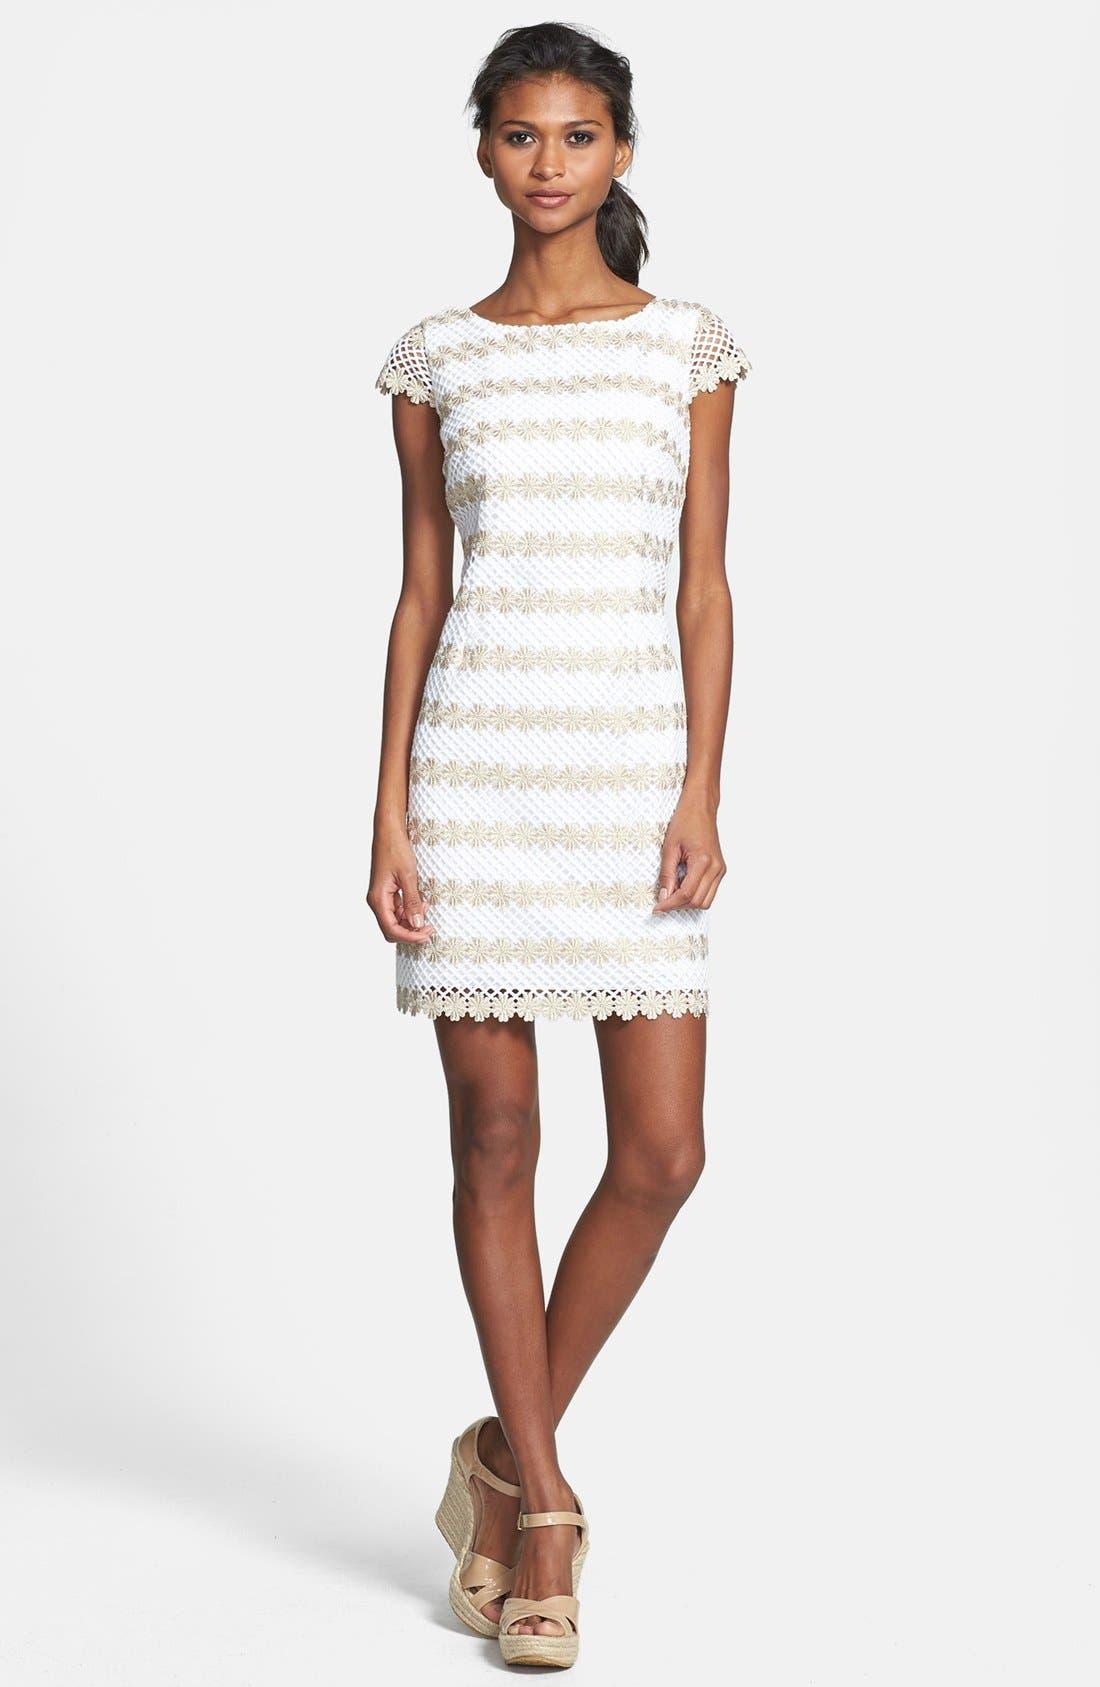 Alternate Image 1 Selected - Lilly Pulitzer® 'Barbara' Lace Shift Dress